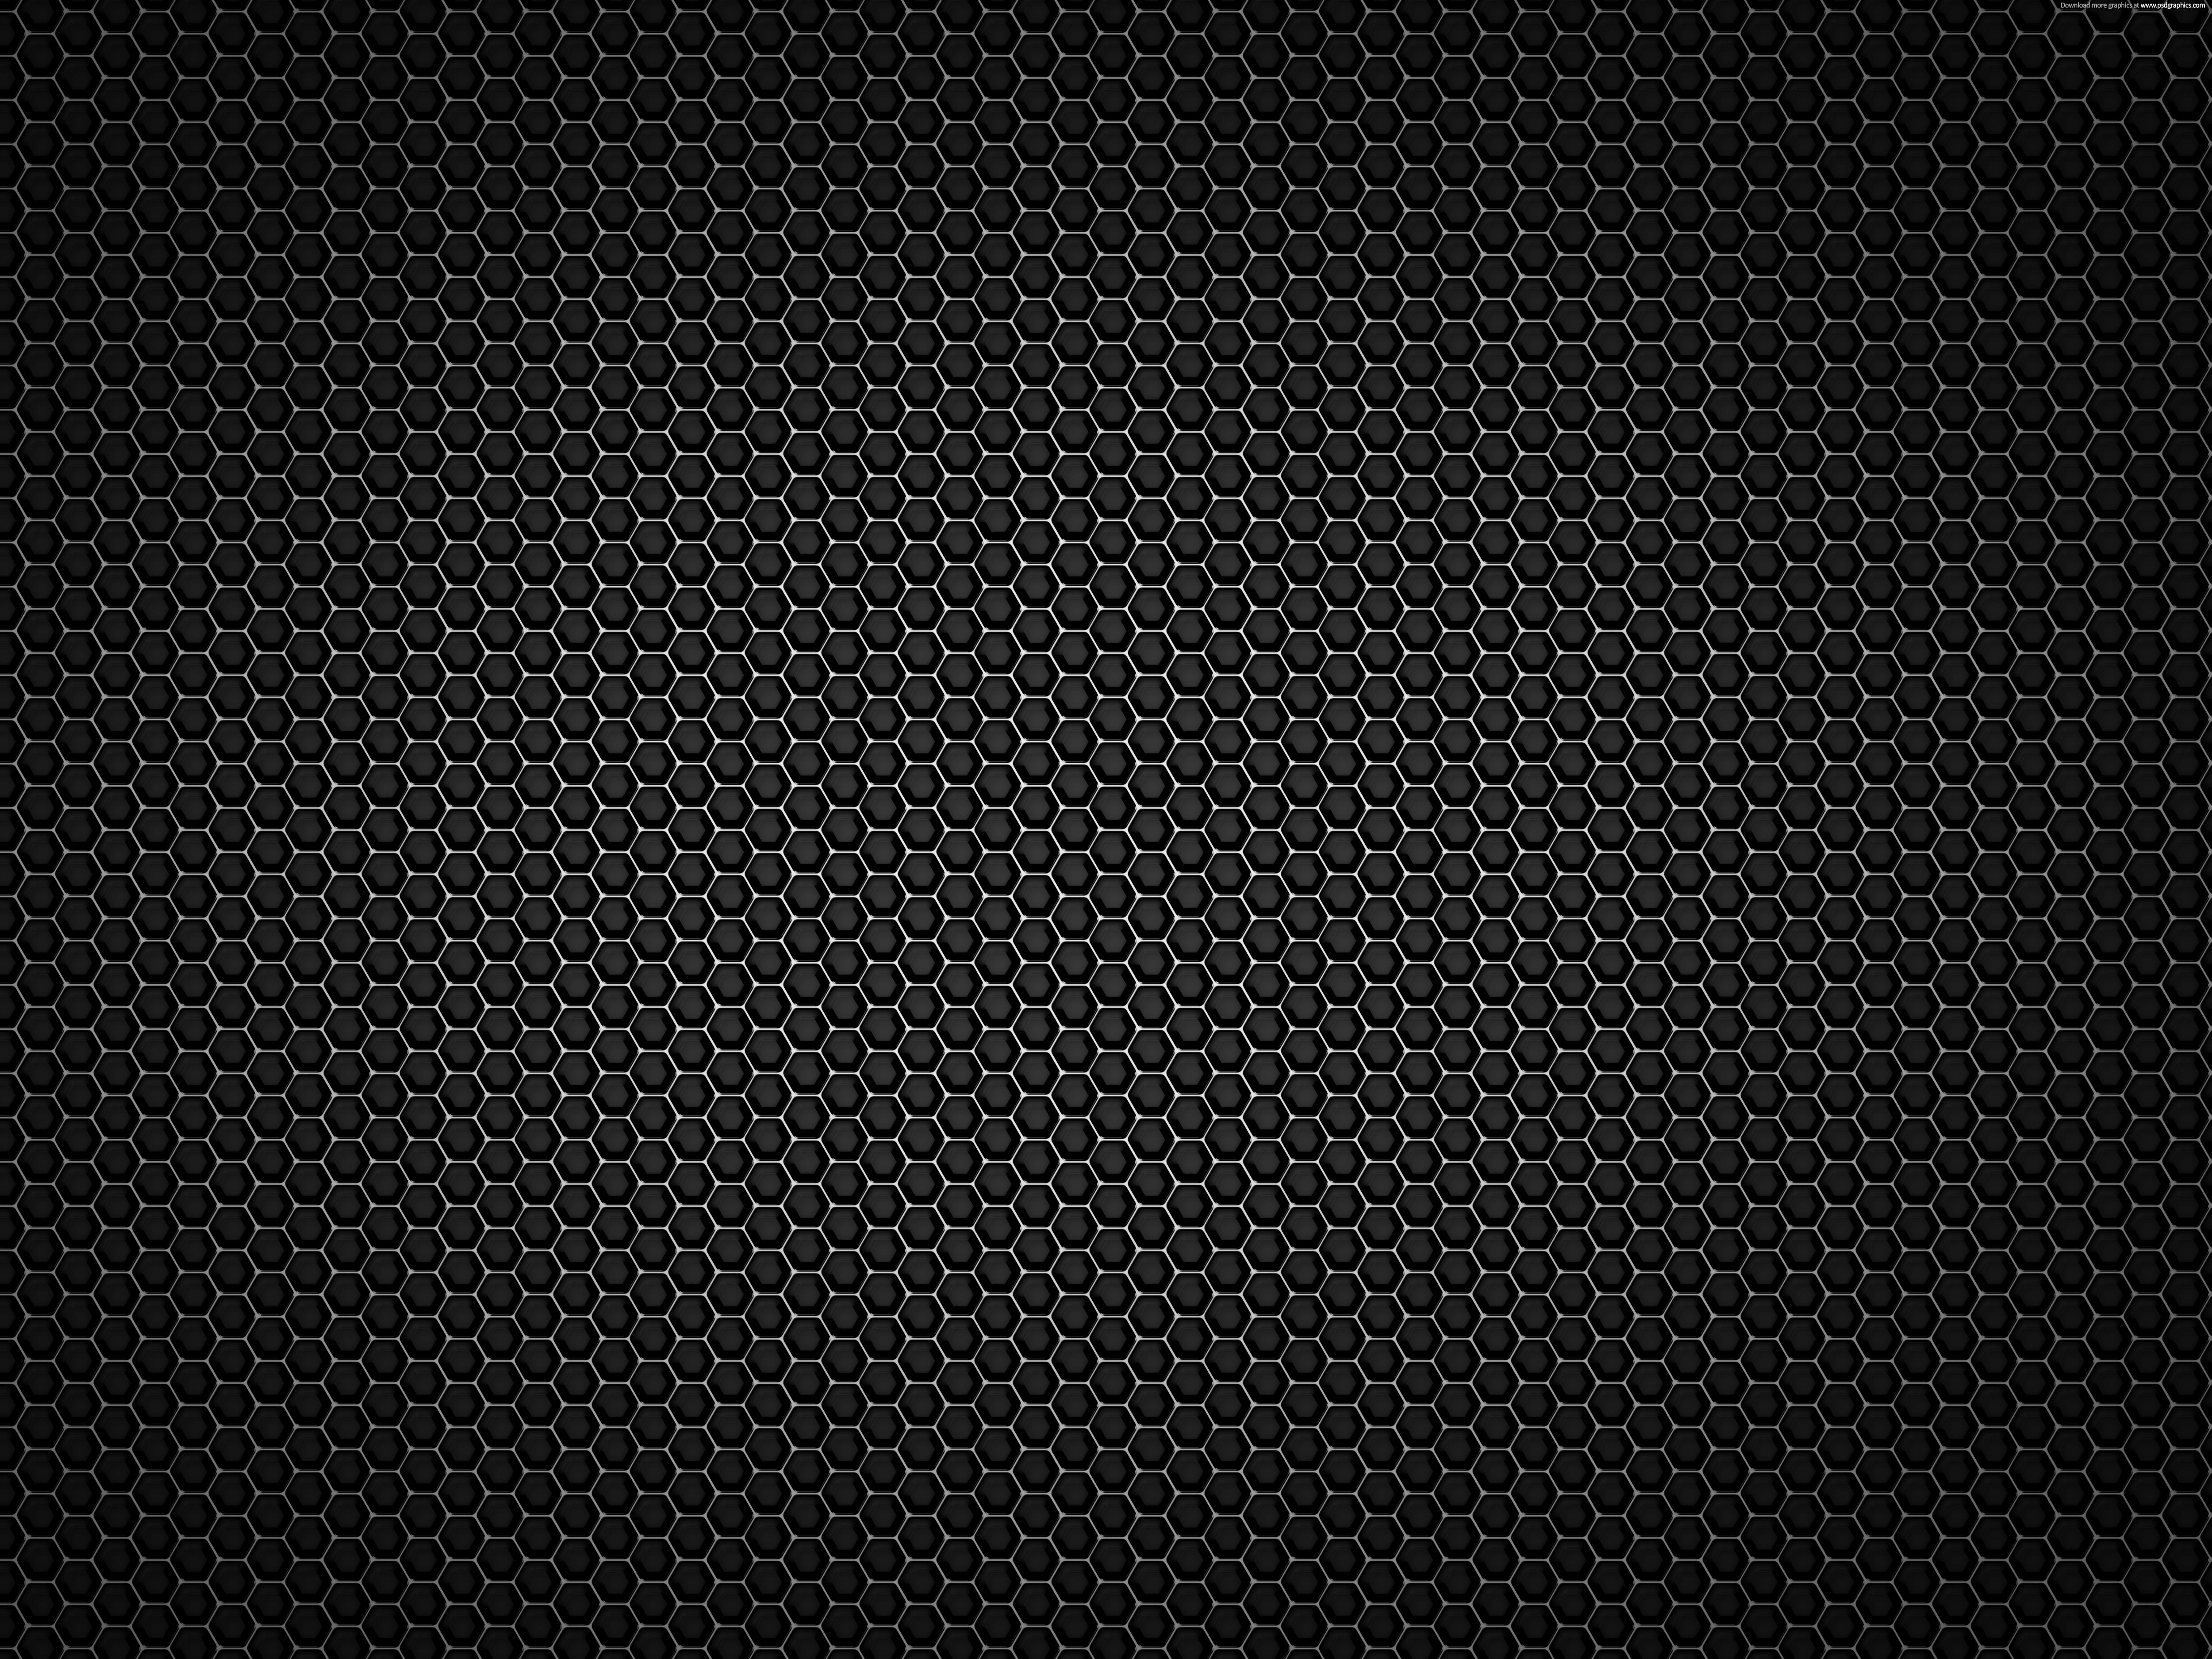 Honeycomb metal mesh background PSDGraphics 5000x3750